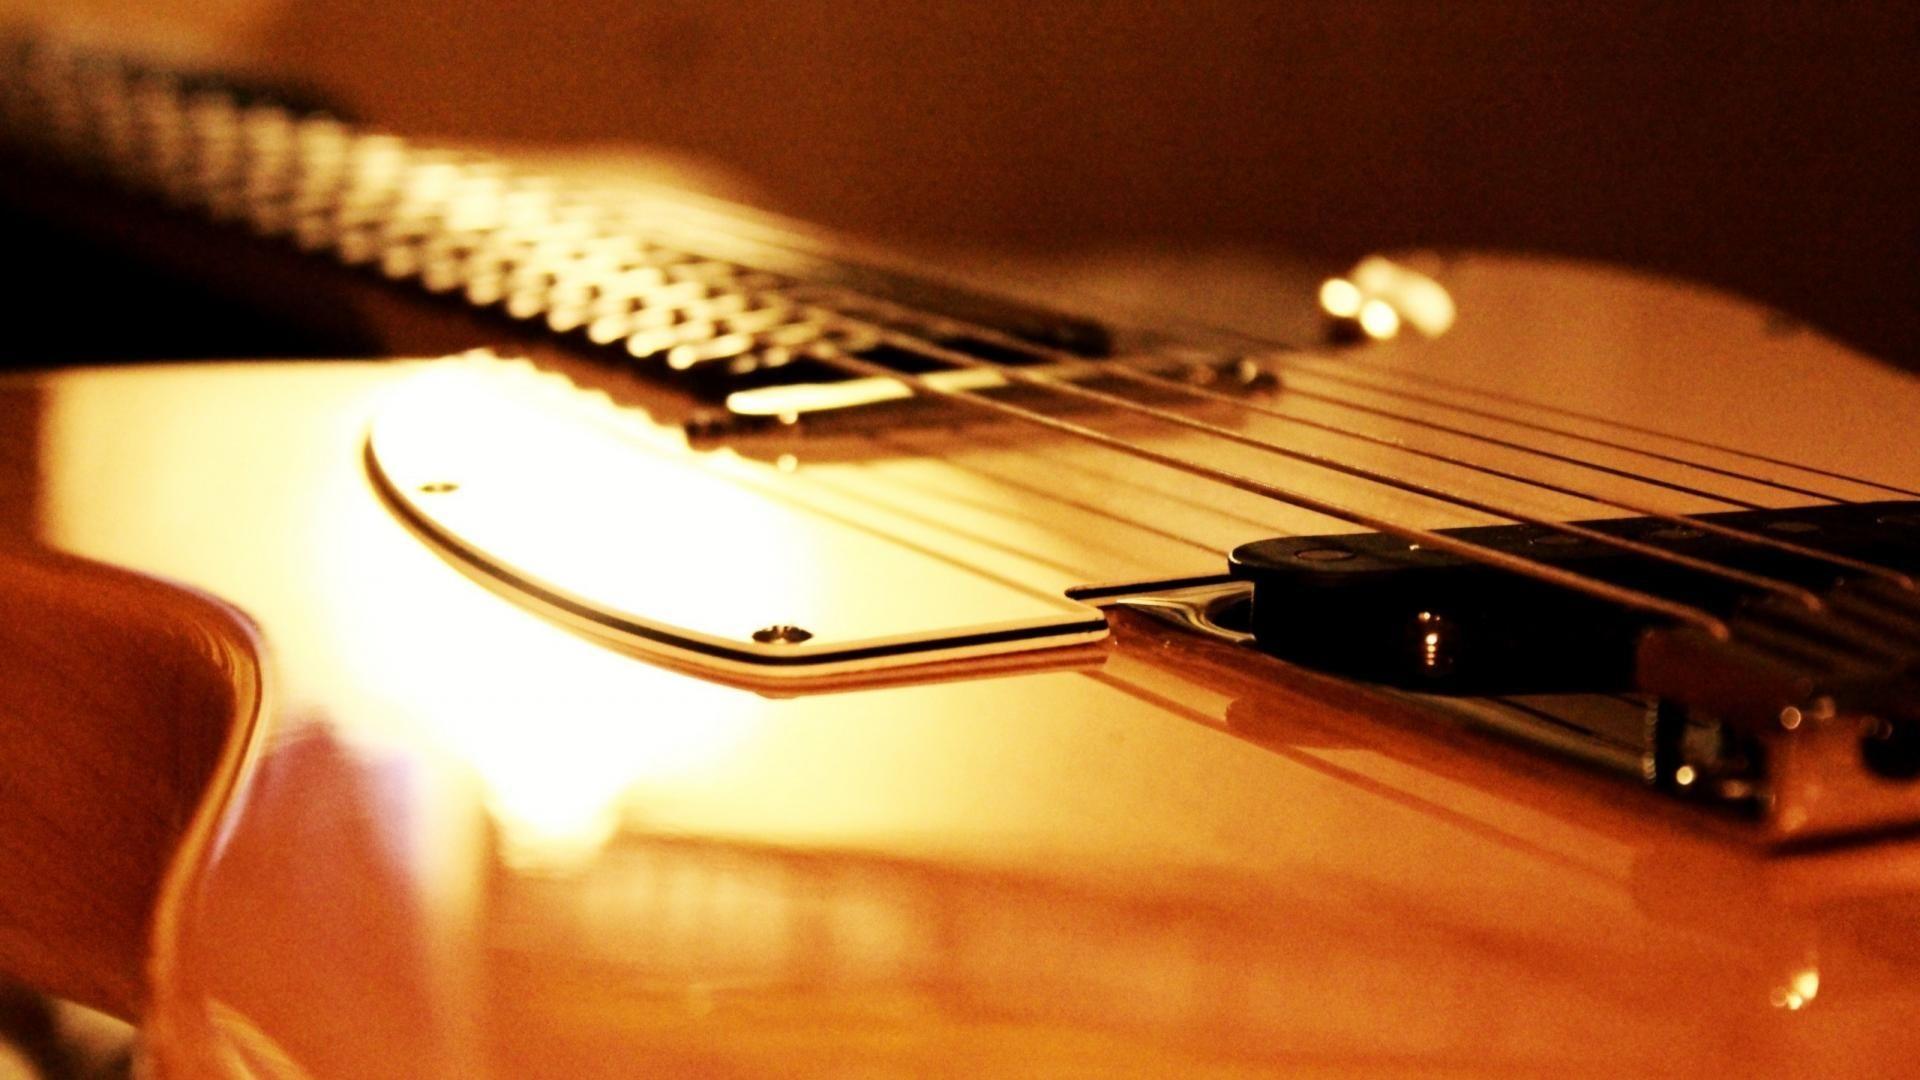 Fender Guitar, Background